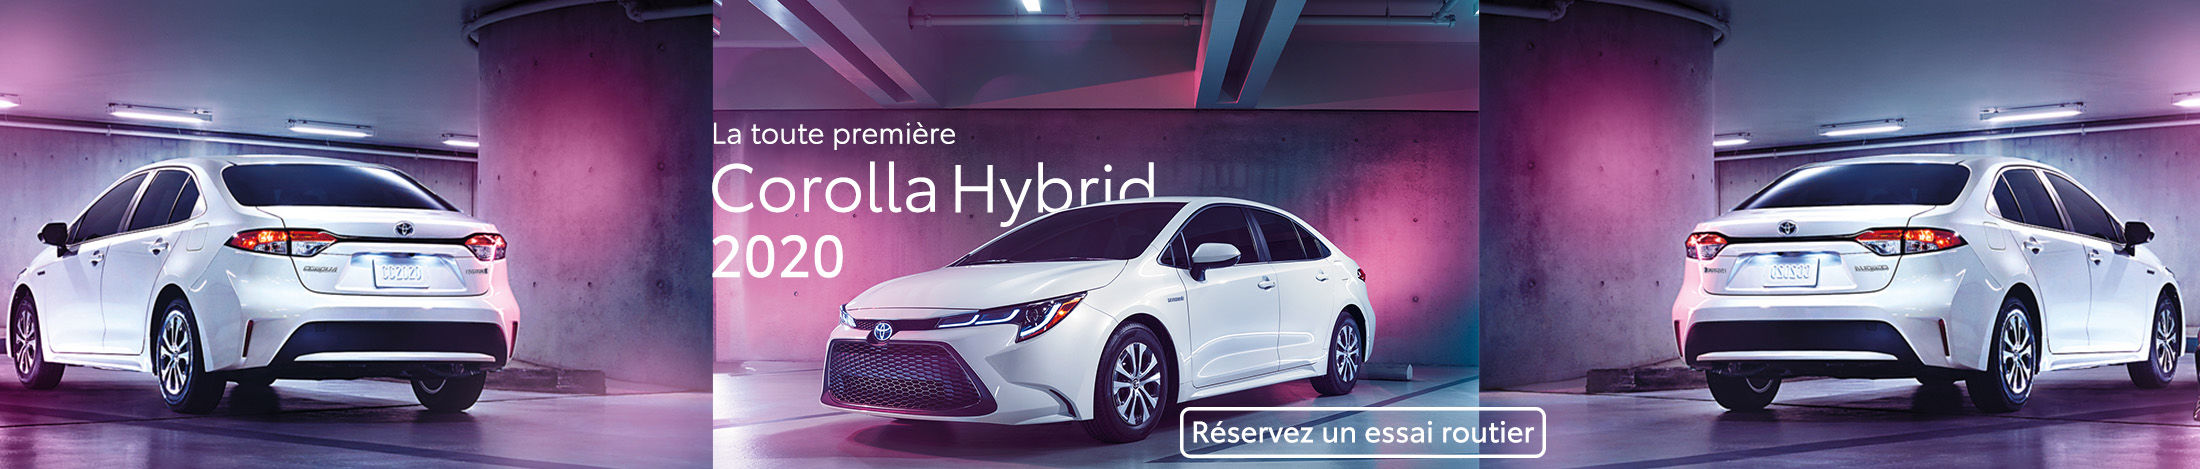 Corolla Hybride 2020 Toyota